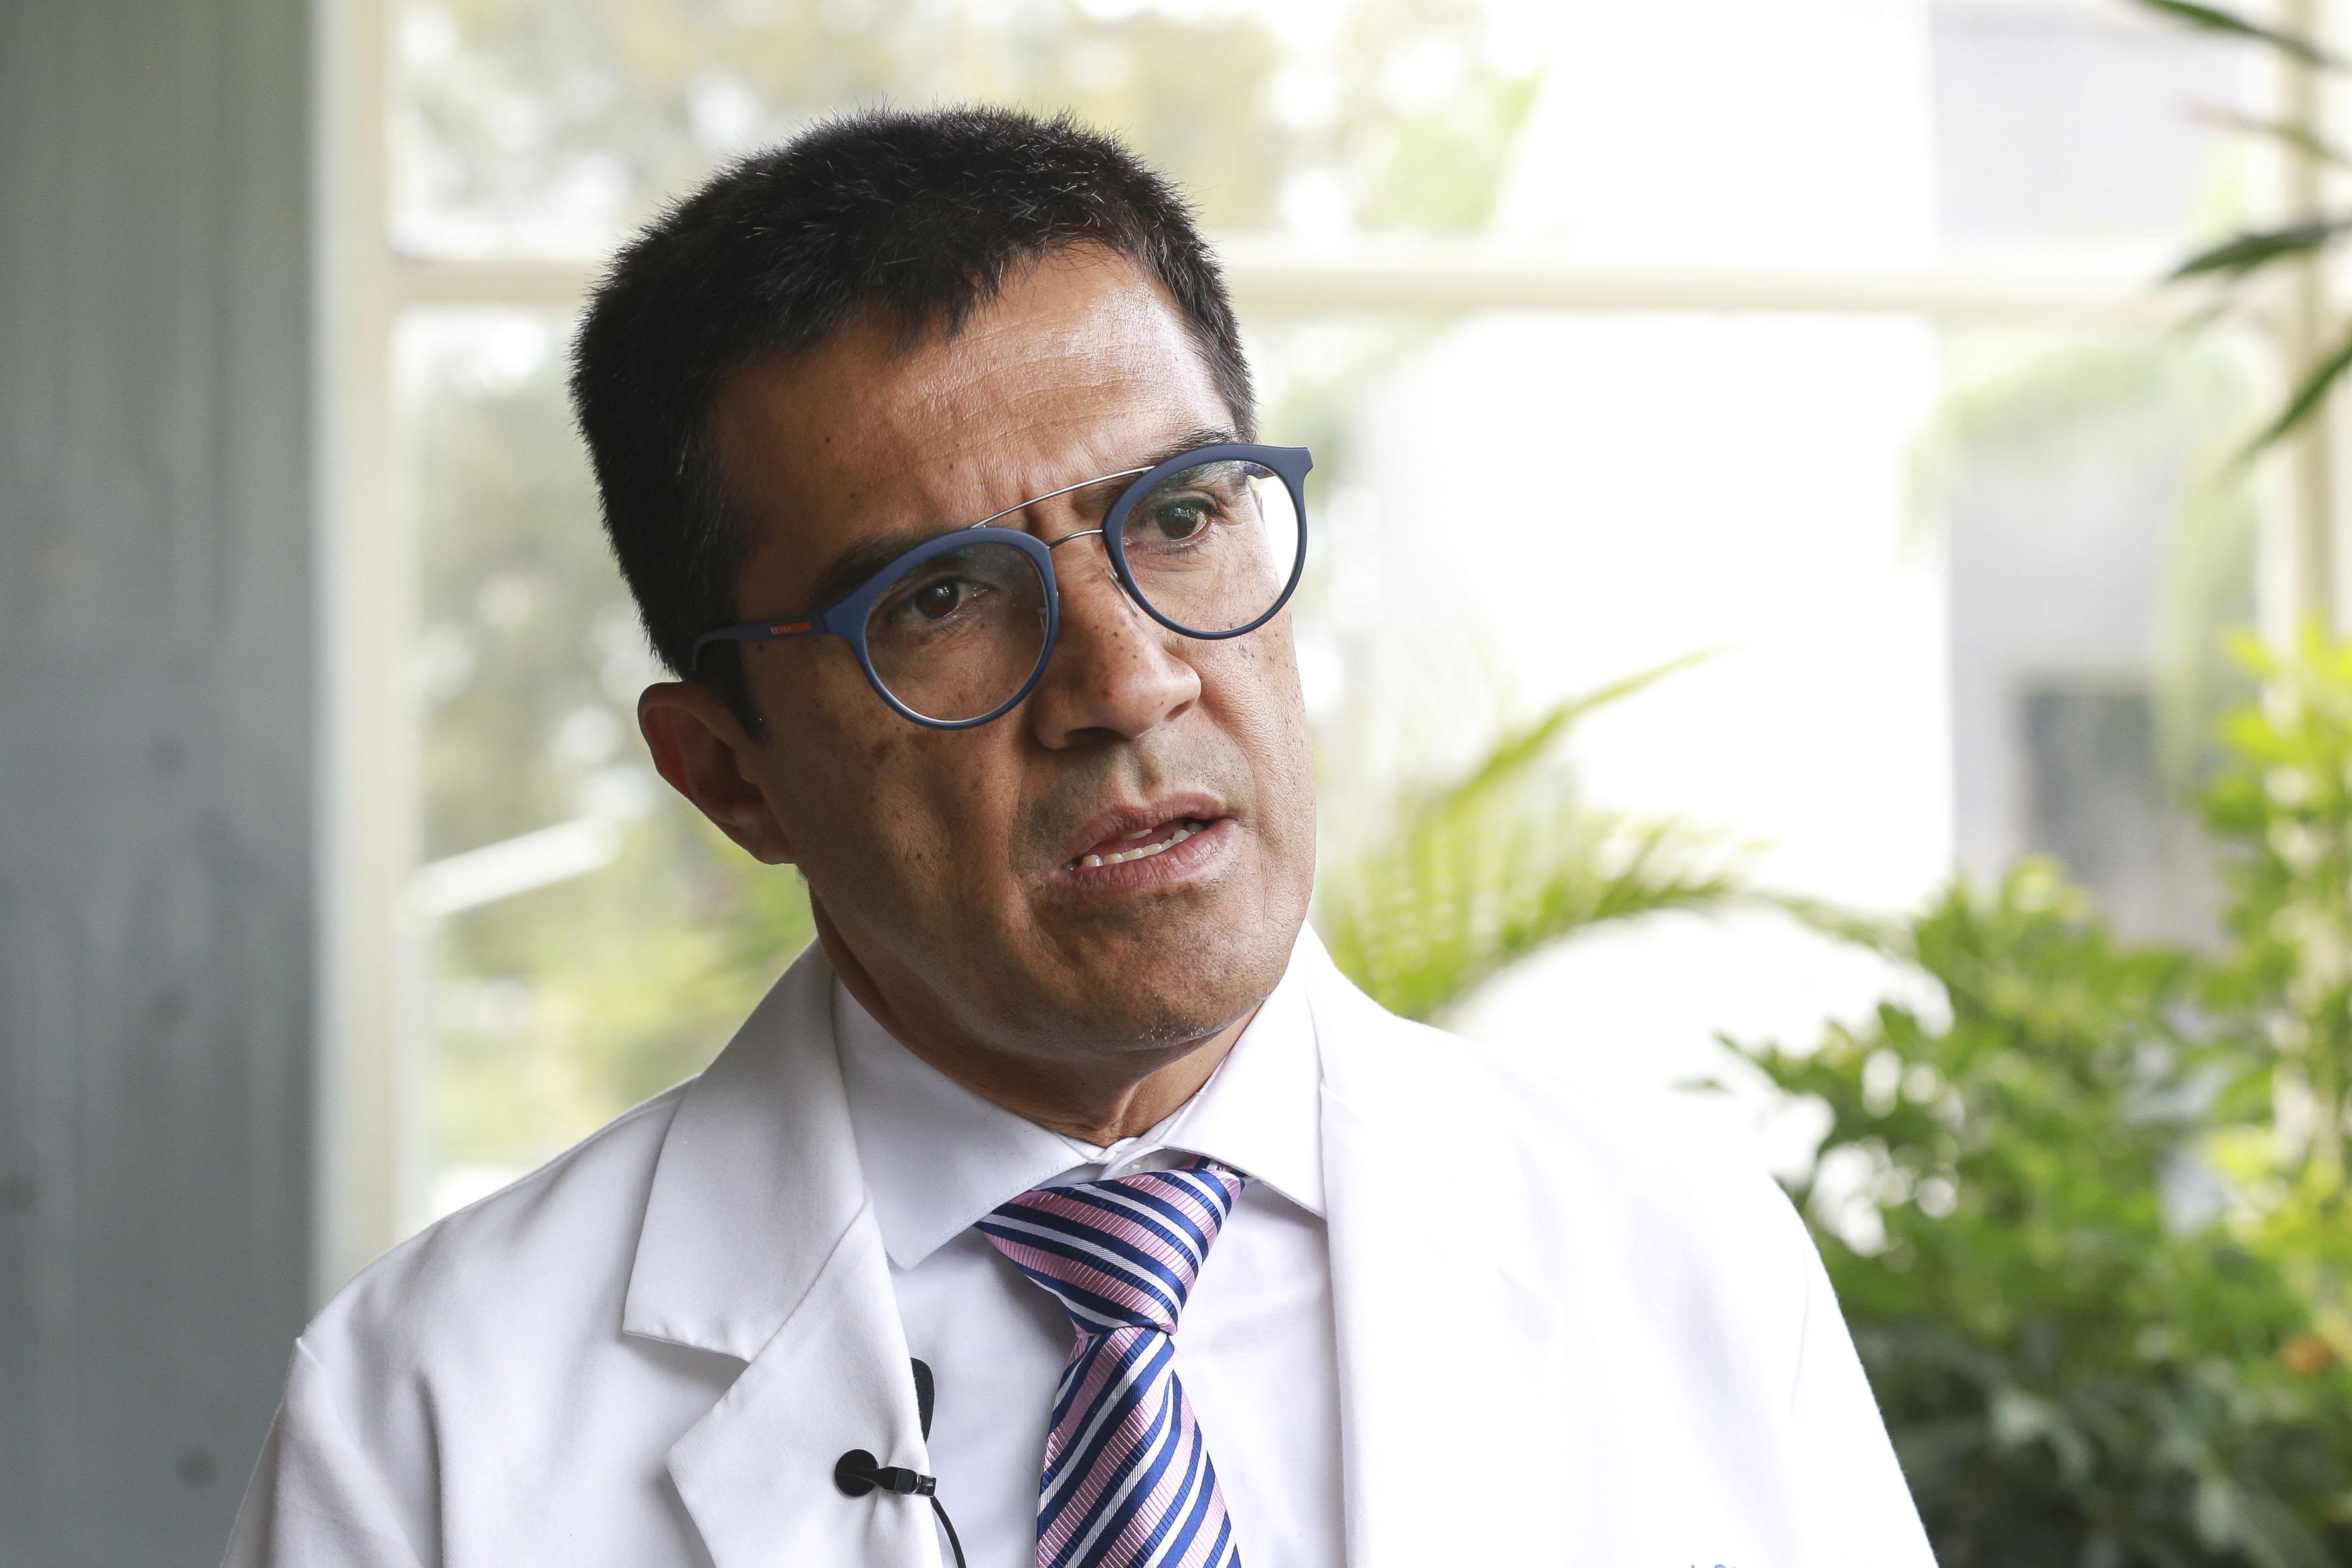 Dr. Vidal Delgado